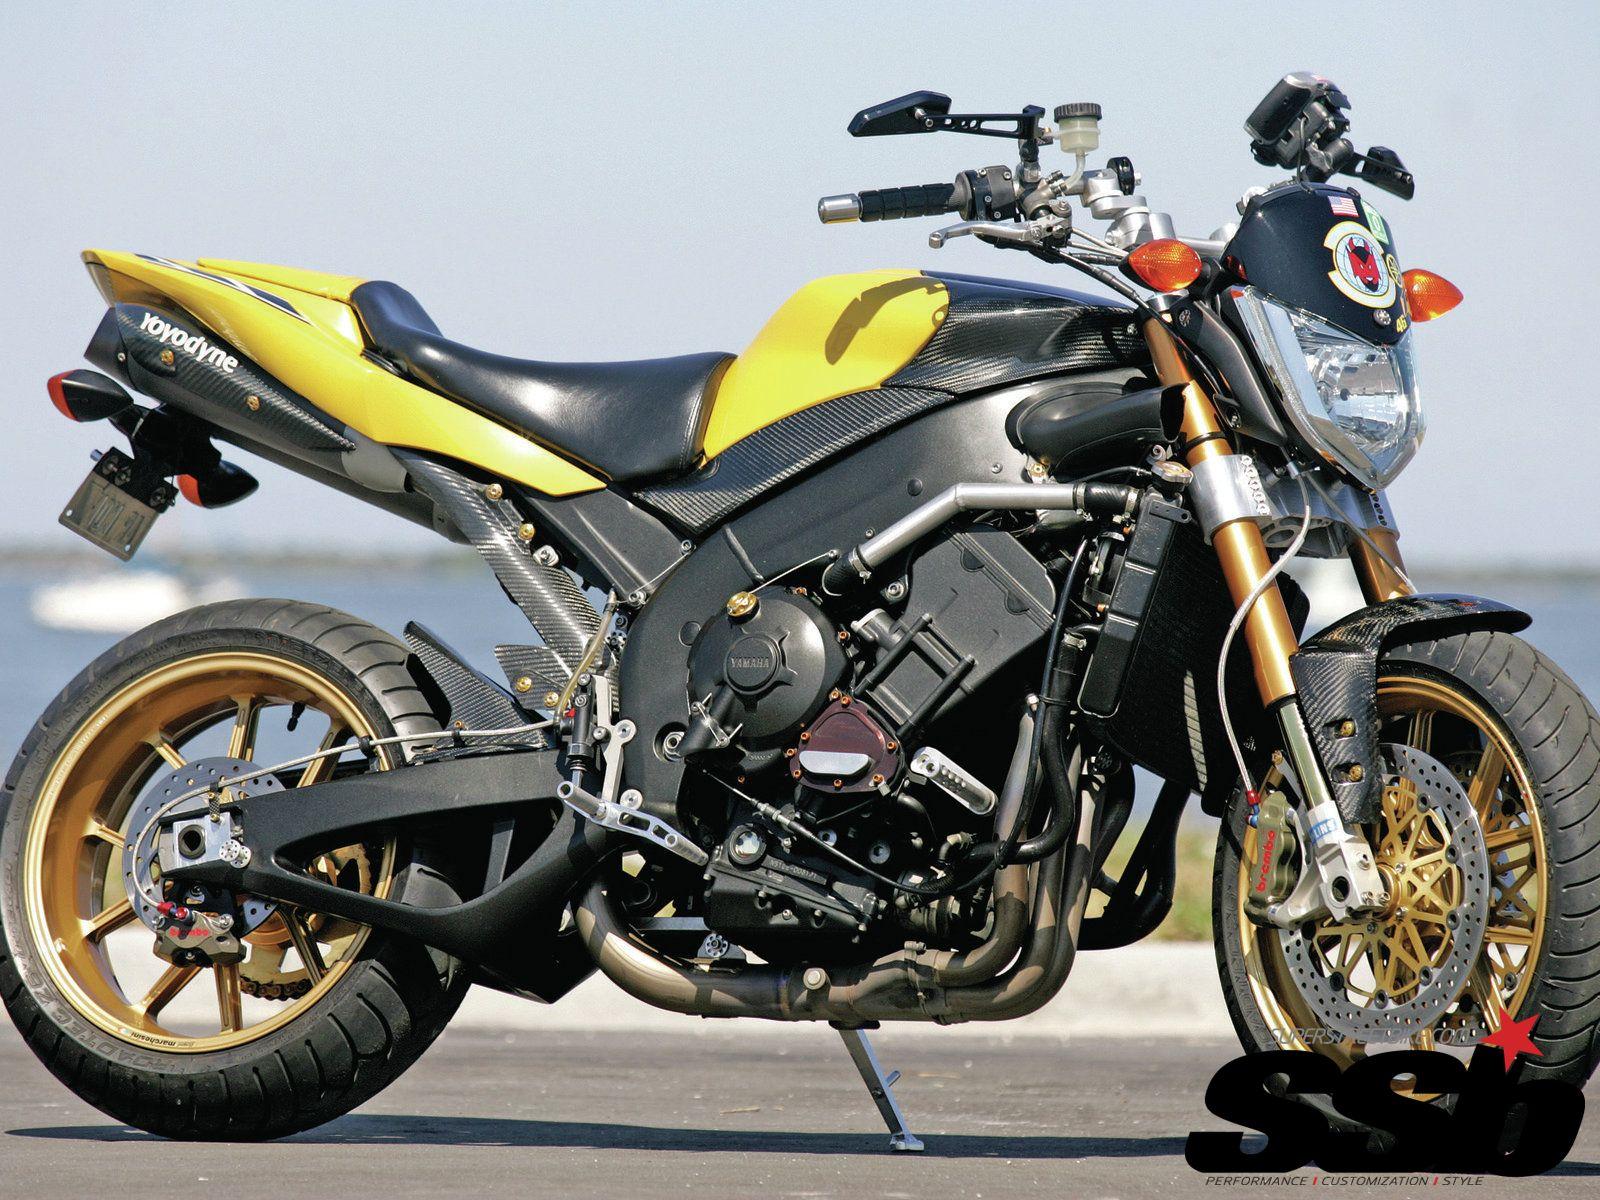 2004 yamaha fz1 tuning 3 motorcycles pinterest. Black Bedroom Furniture Sets. Home Design Ideas